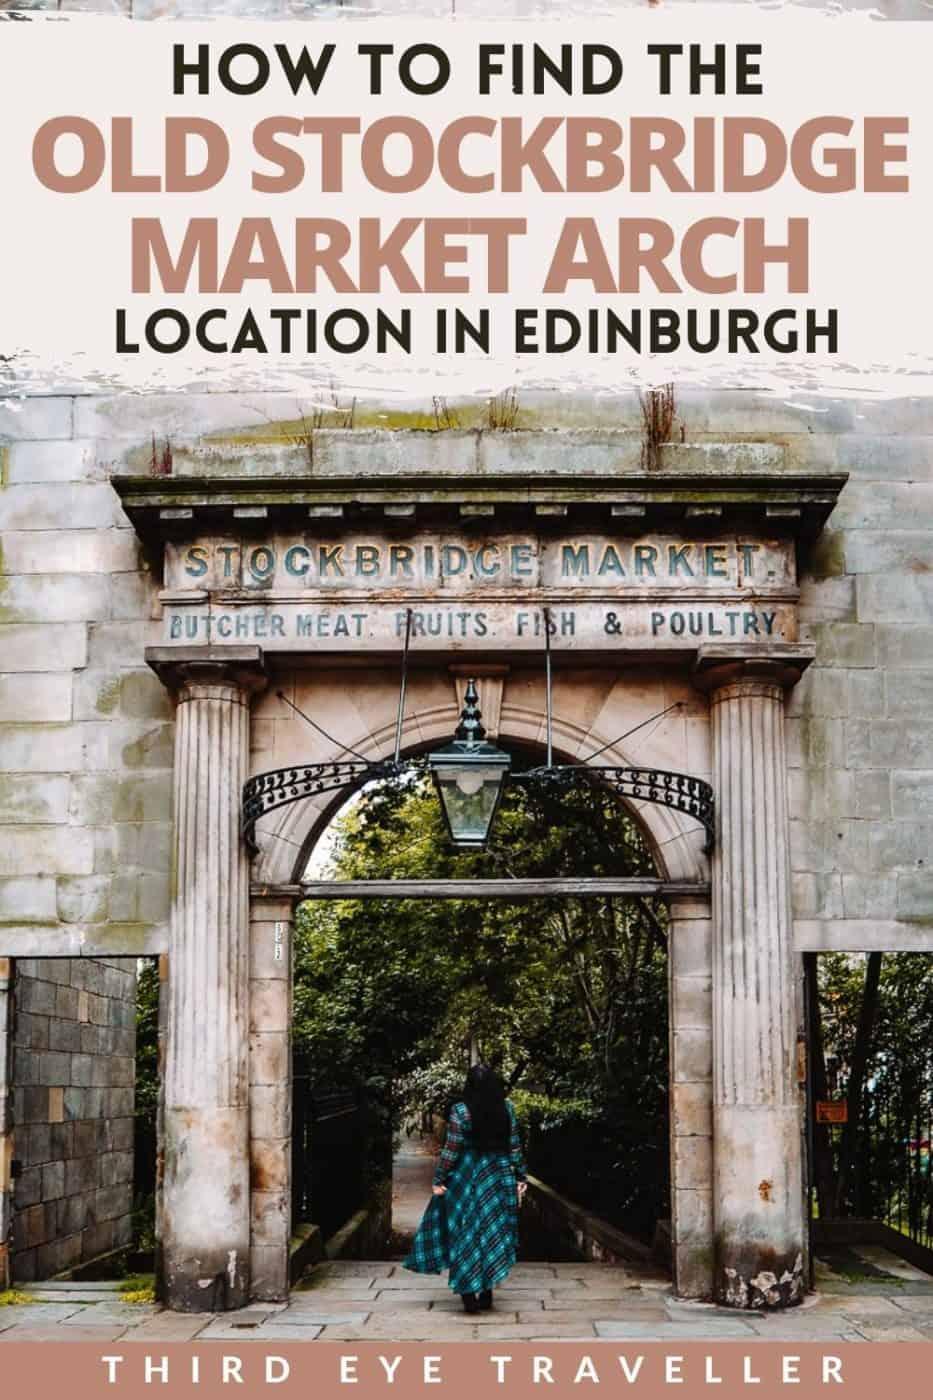 old stockbridge market arch location edinburgh 1